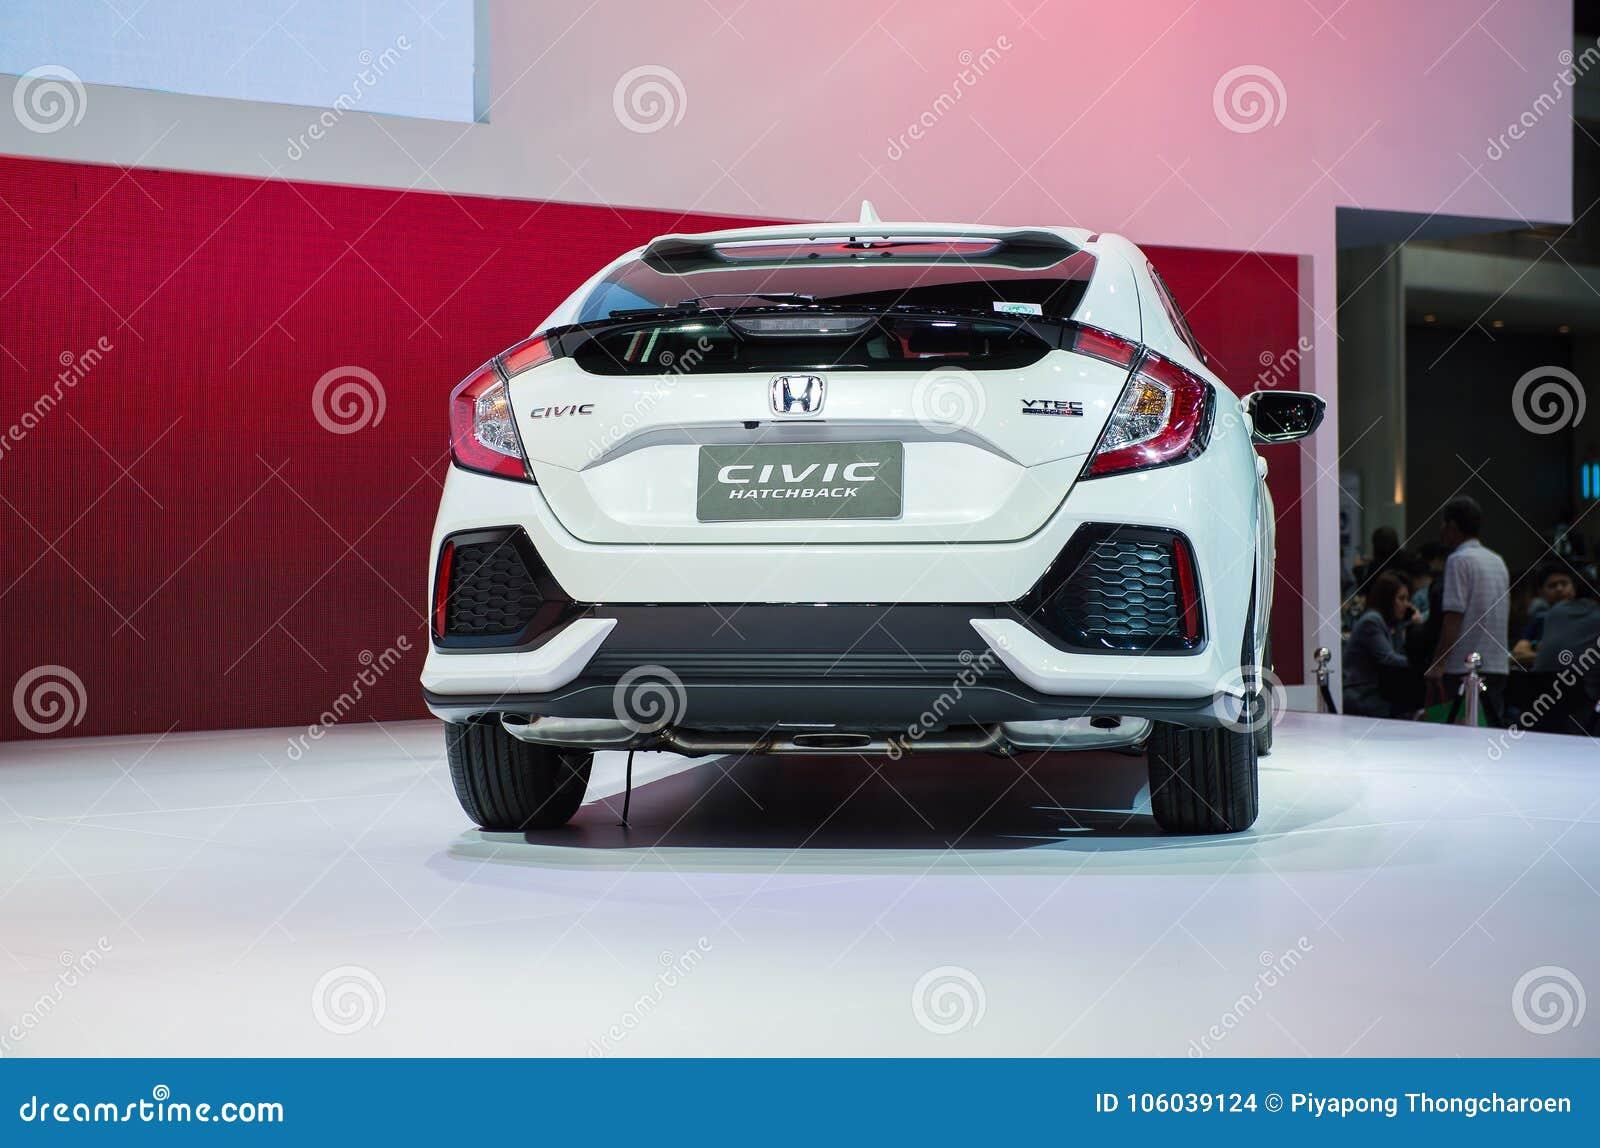 Nonthaburi Thailand December 9 2017 View Of All New Honda Civic